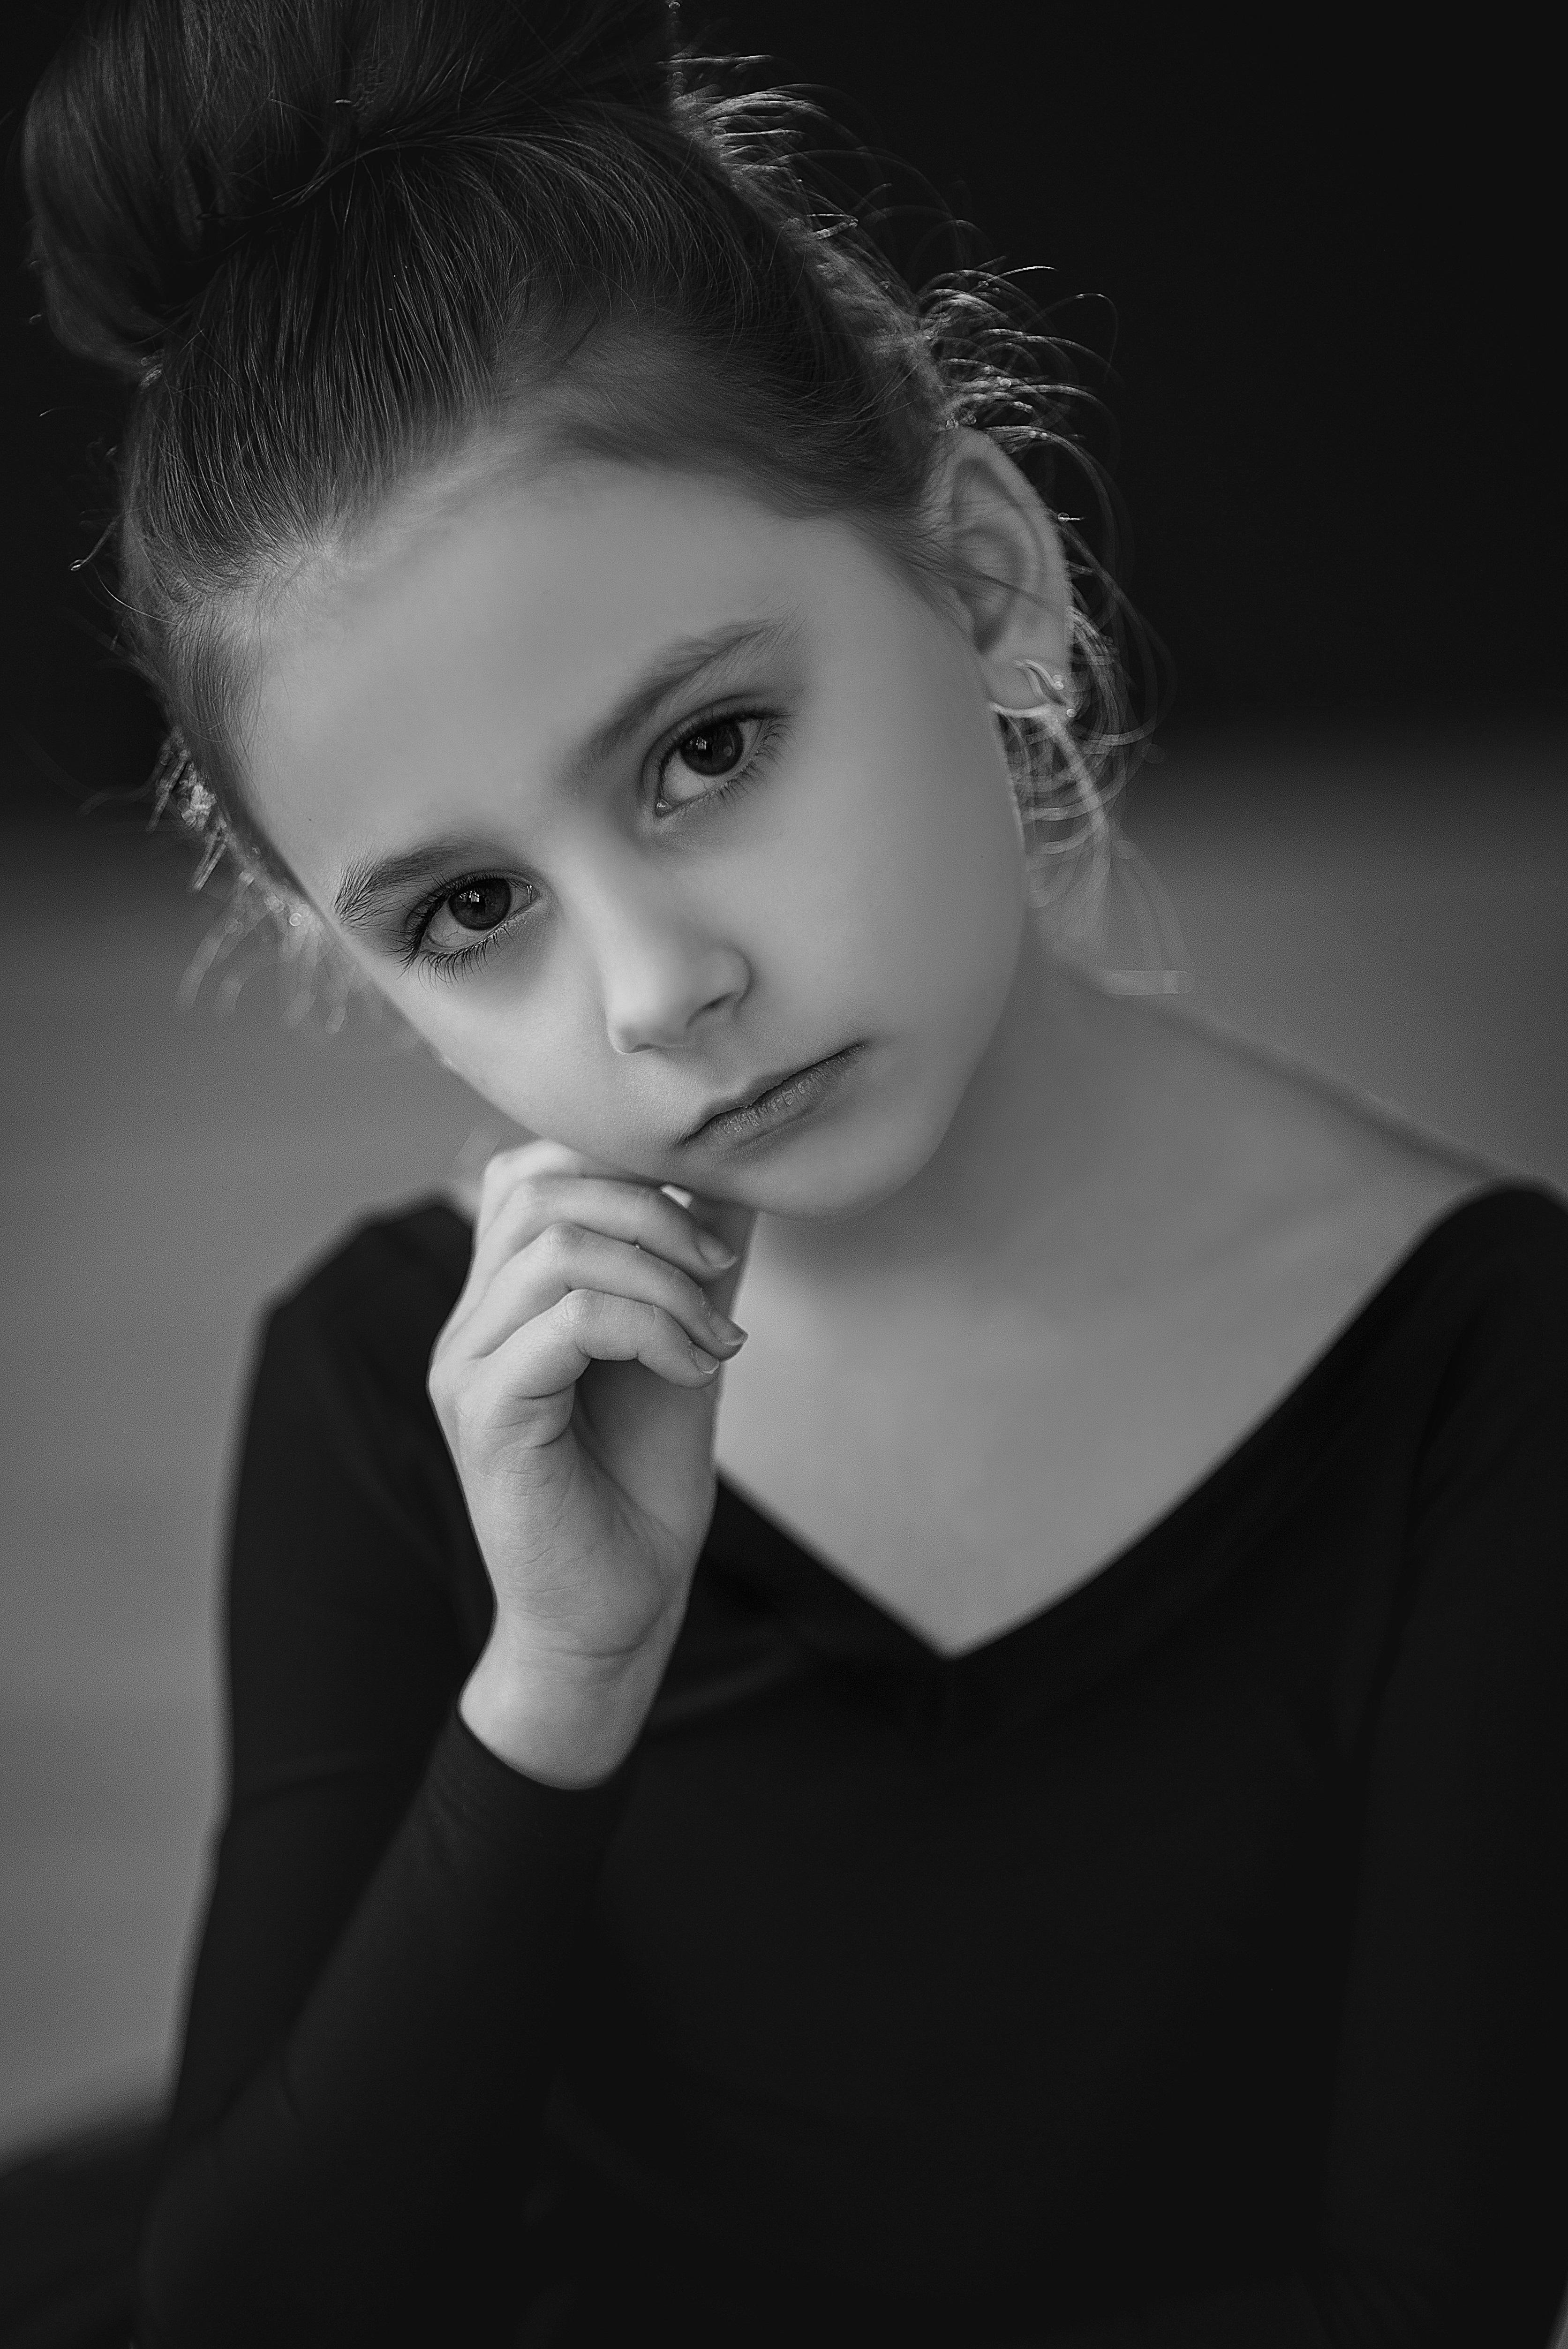 Sofi Tkach